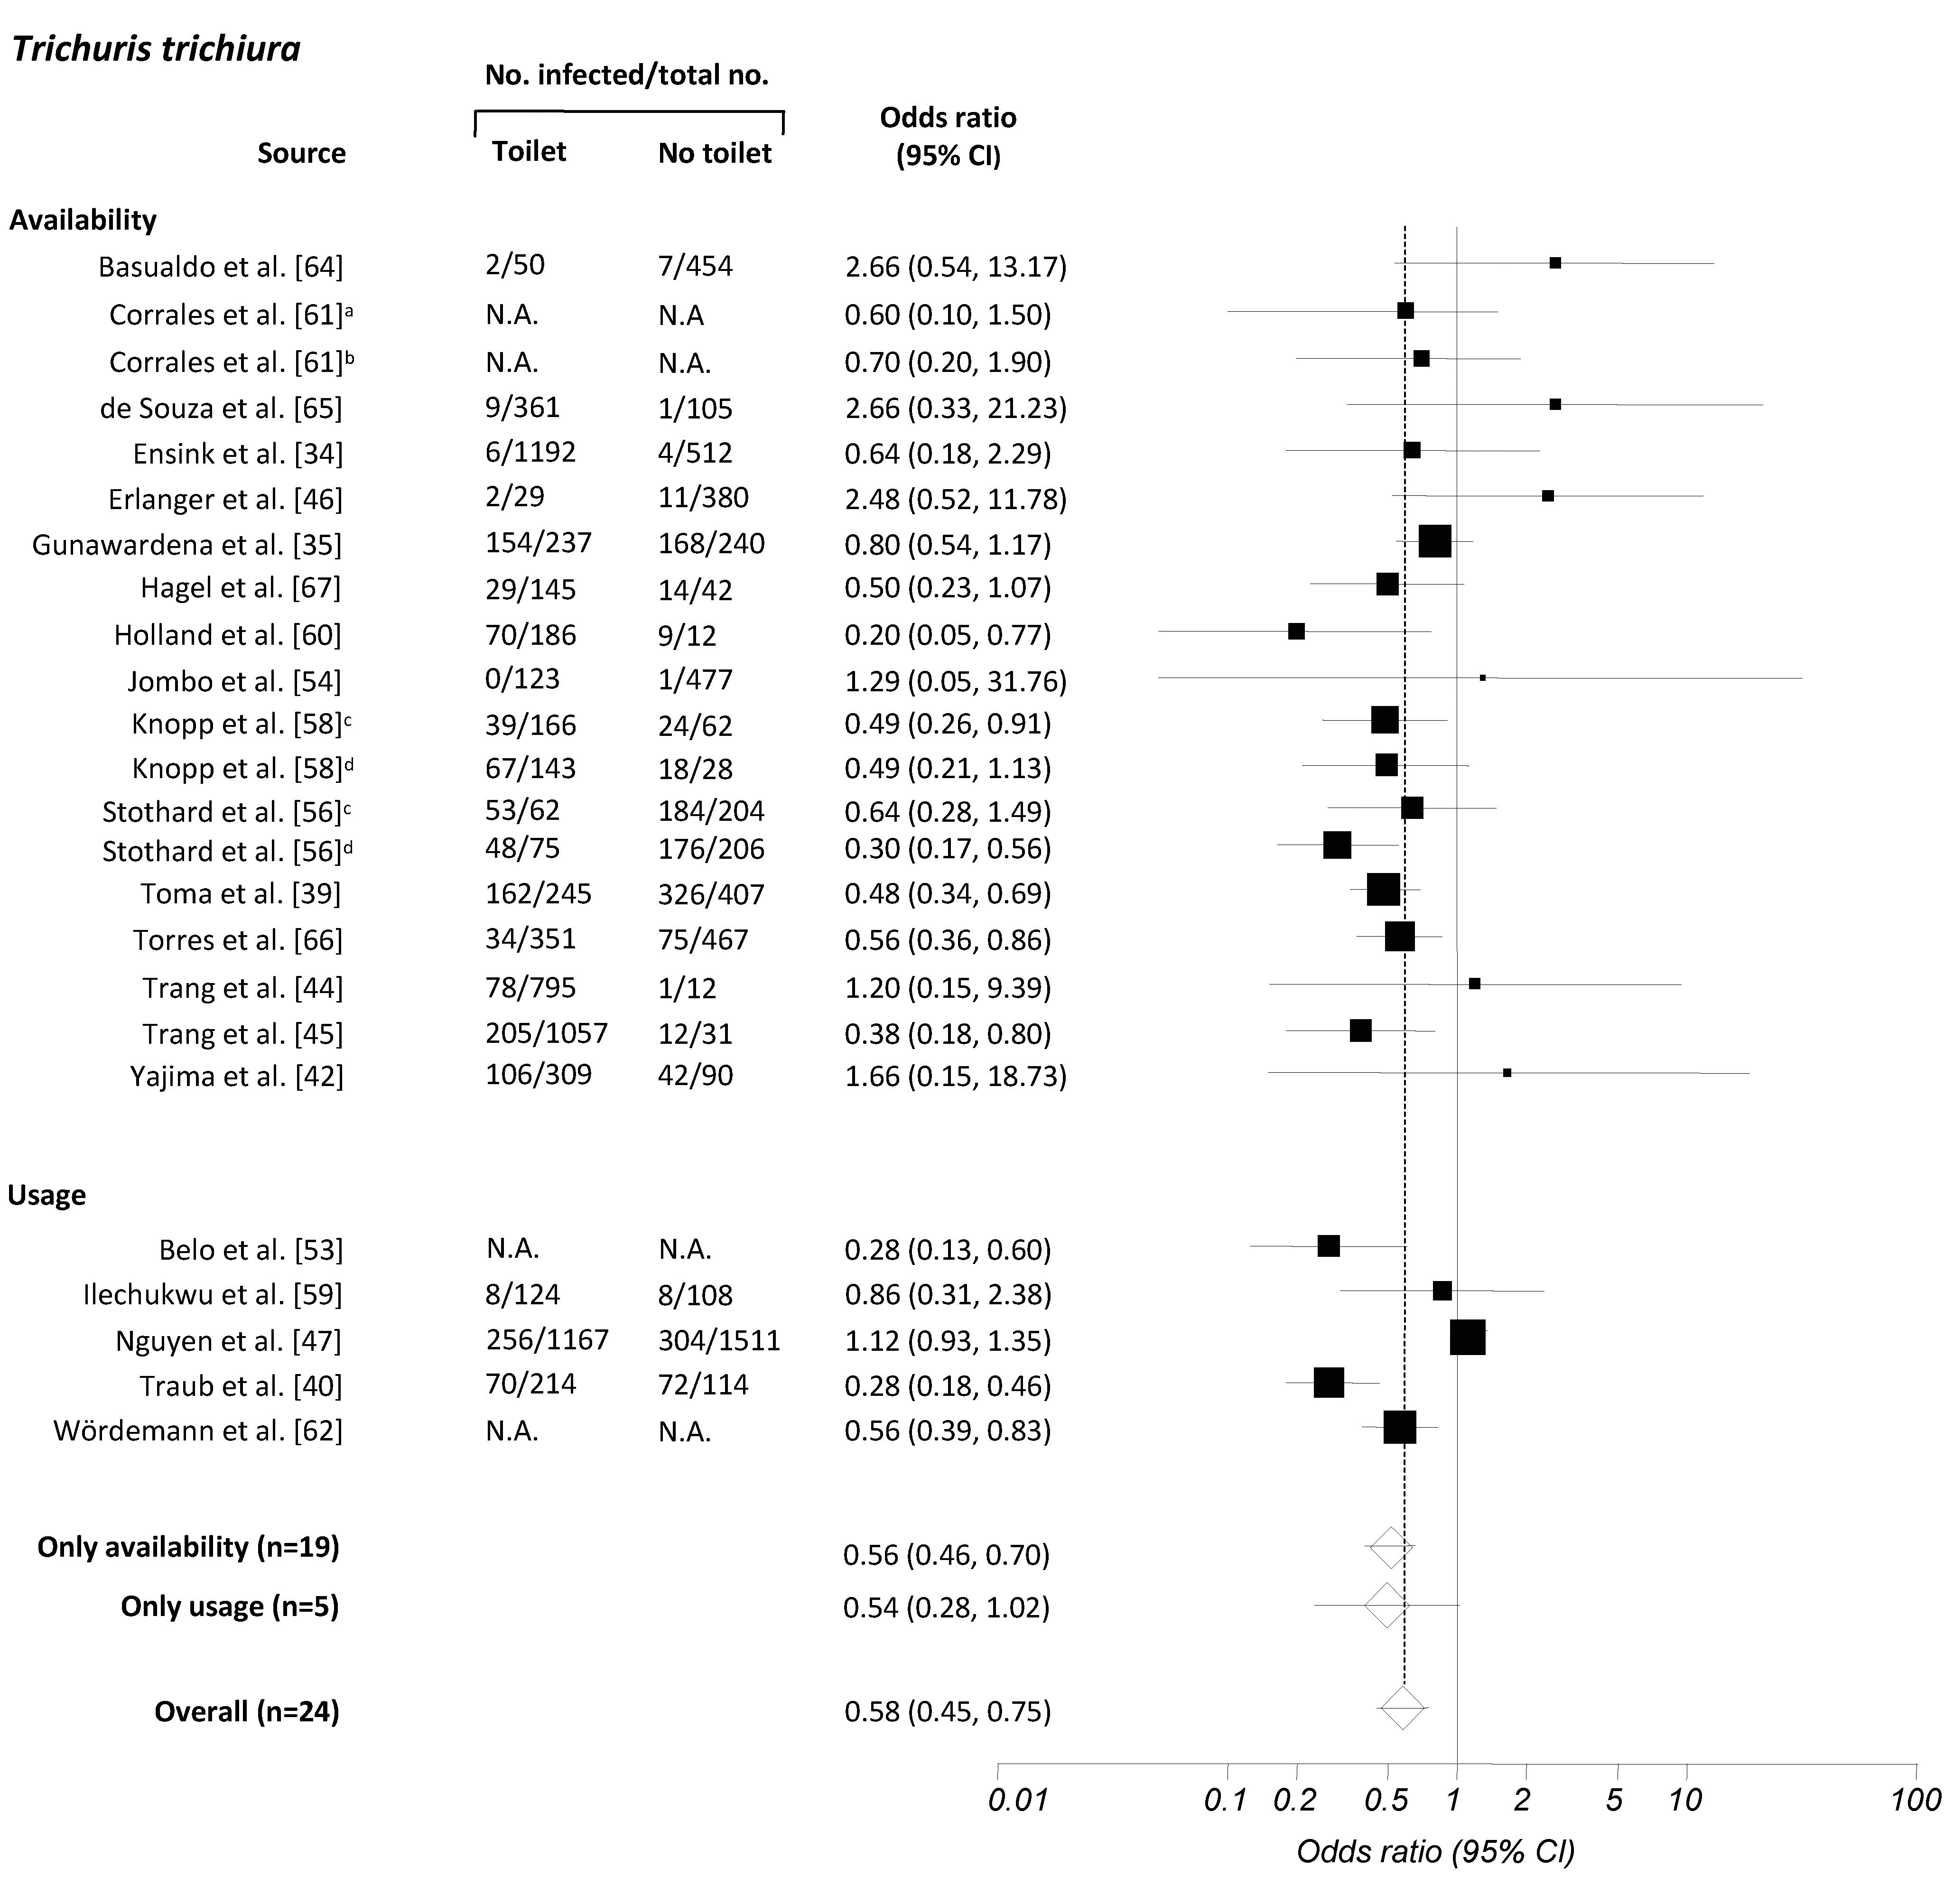 Meta-analysis examining the association of sanitation facilities with <i>T. trichiura</i> infection.